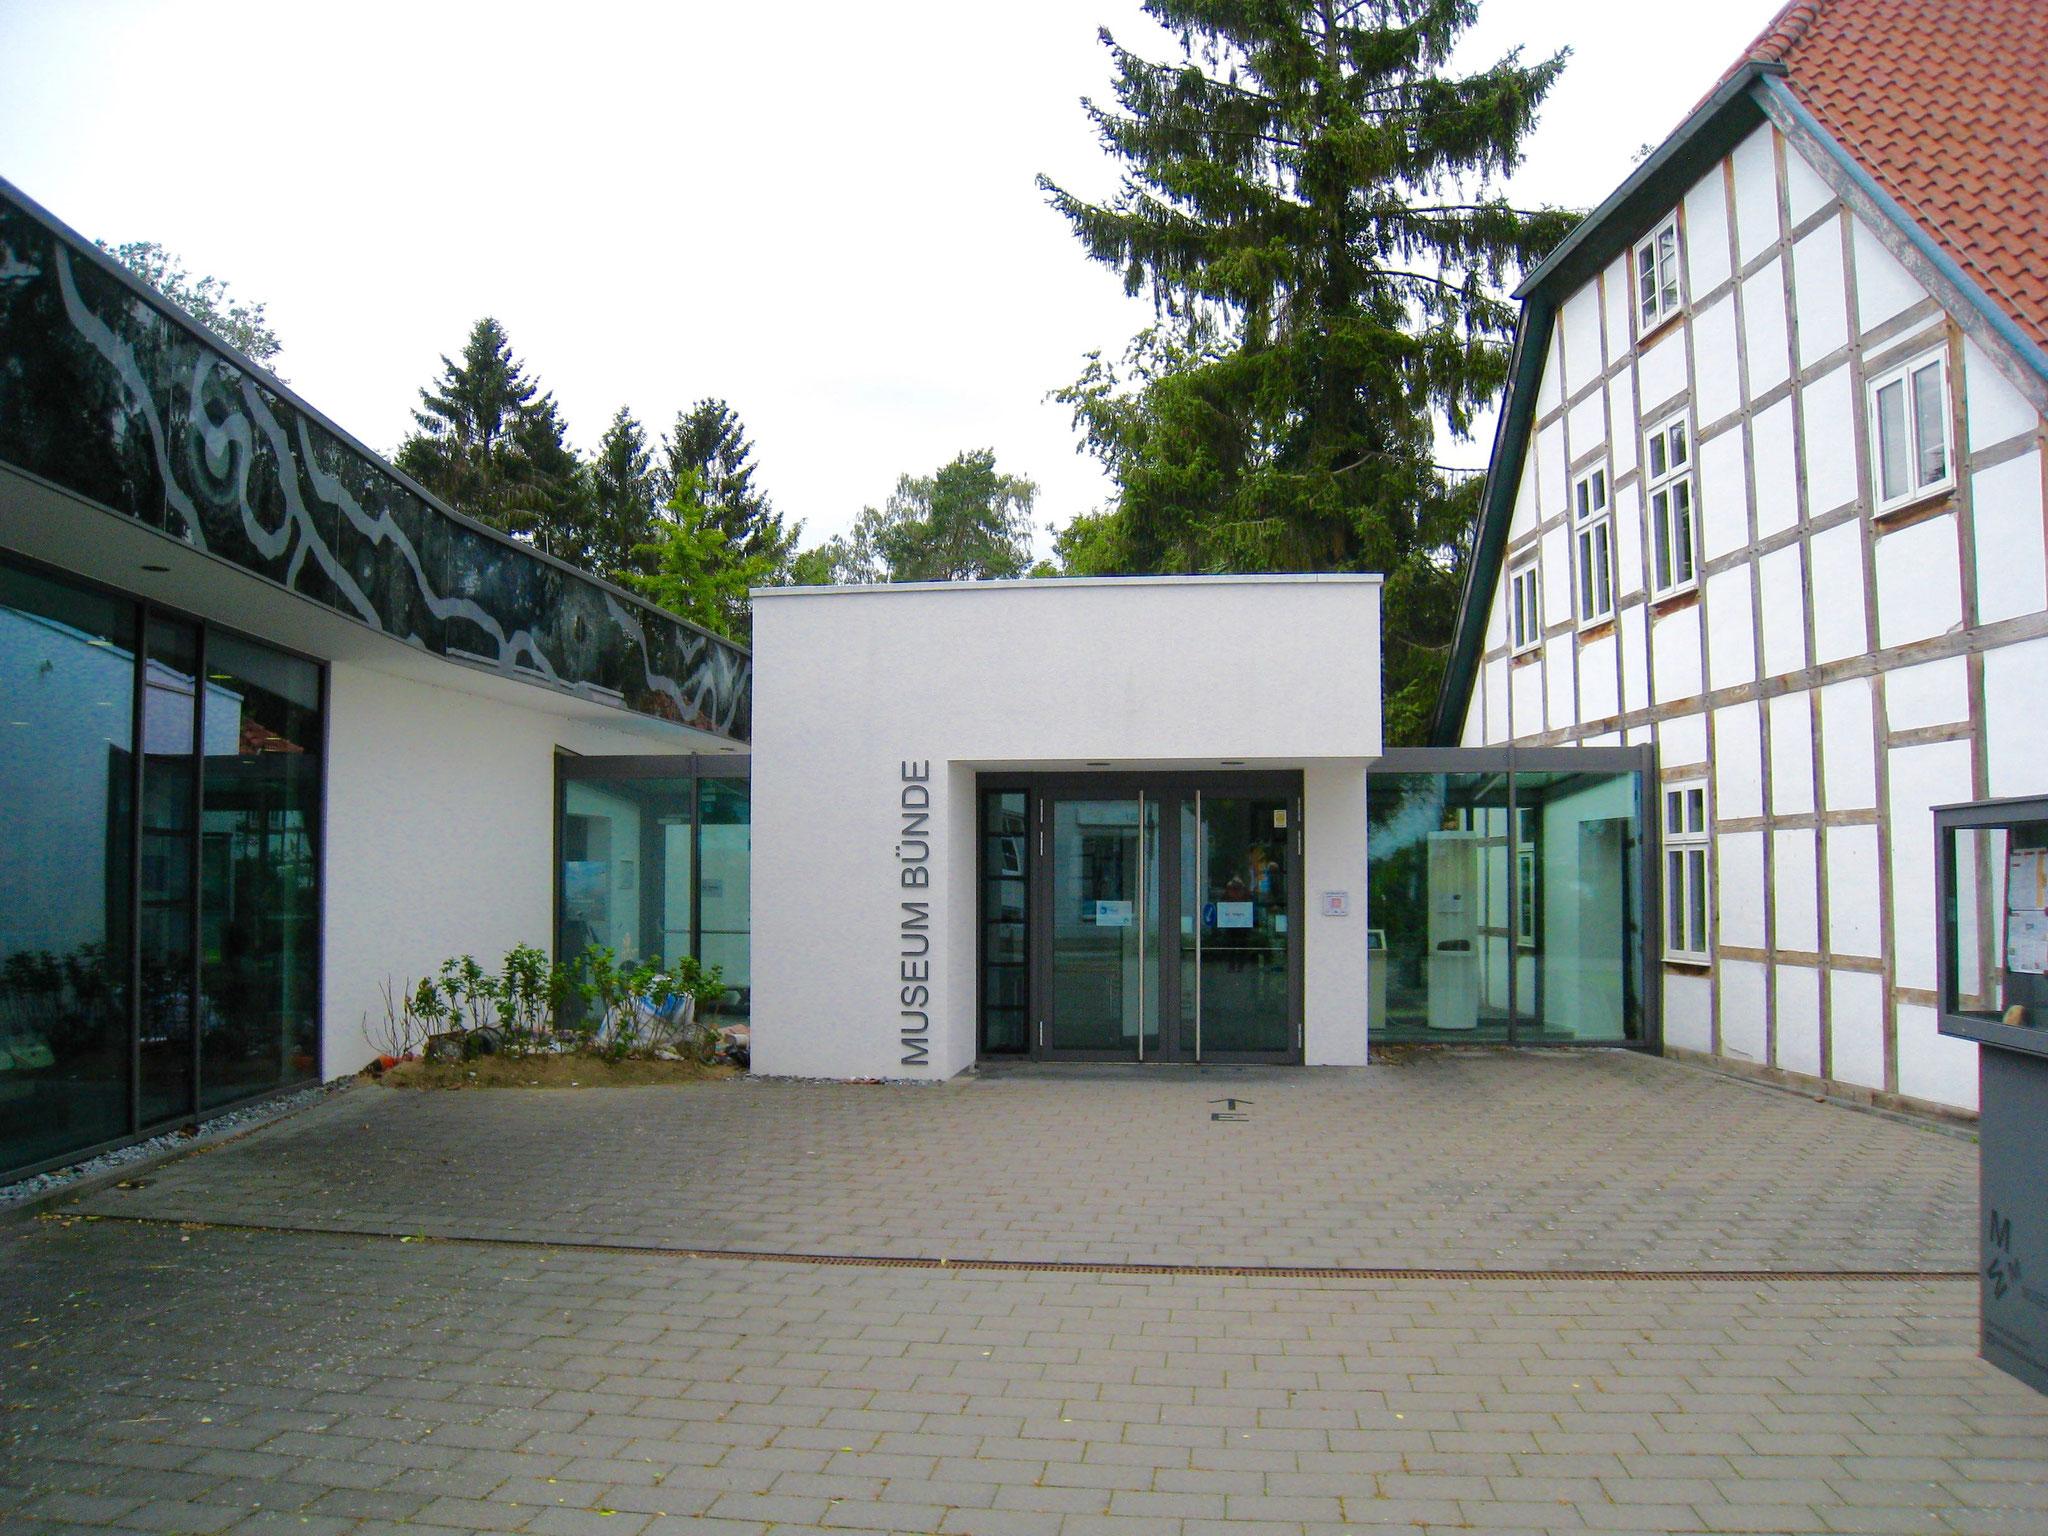 Museumsinsel Bünde: Das Dobergmuseum